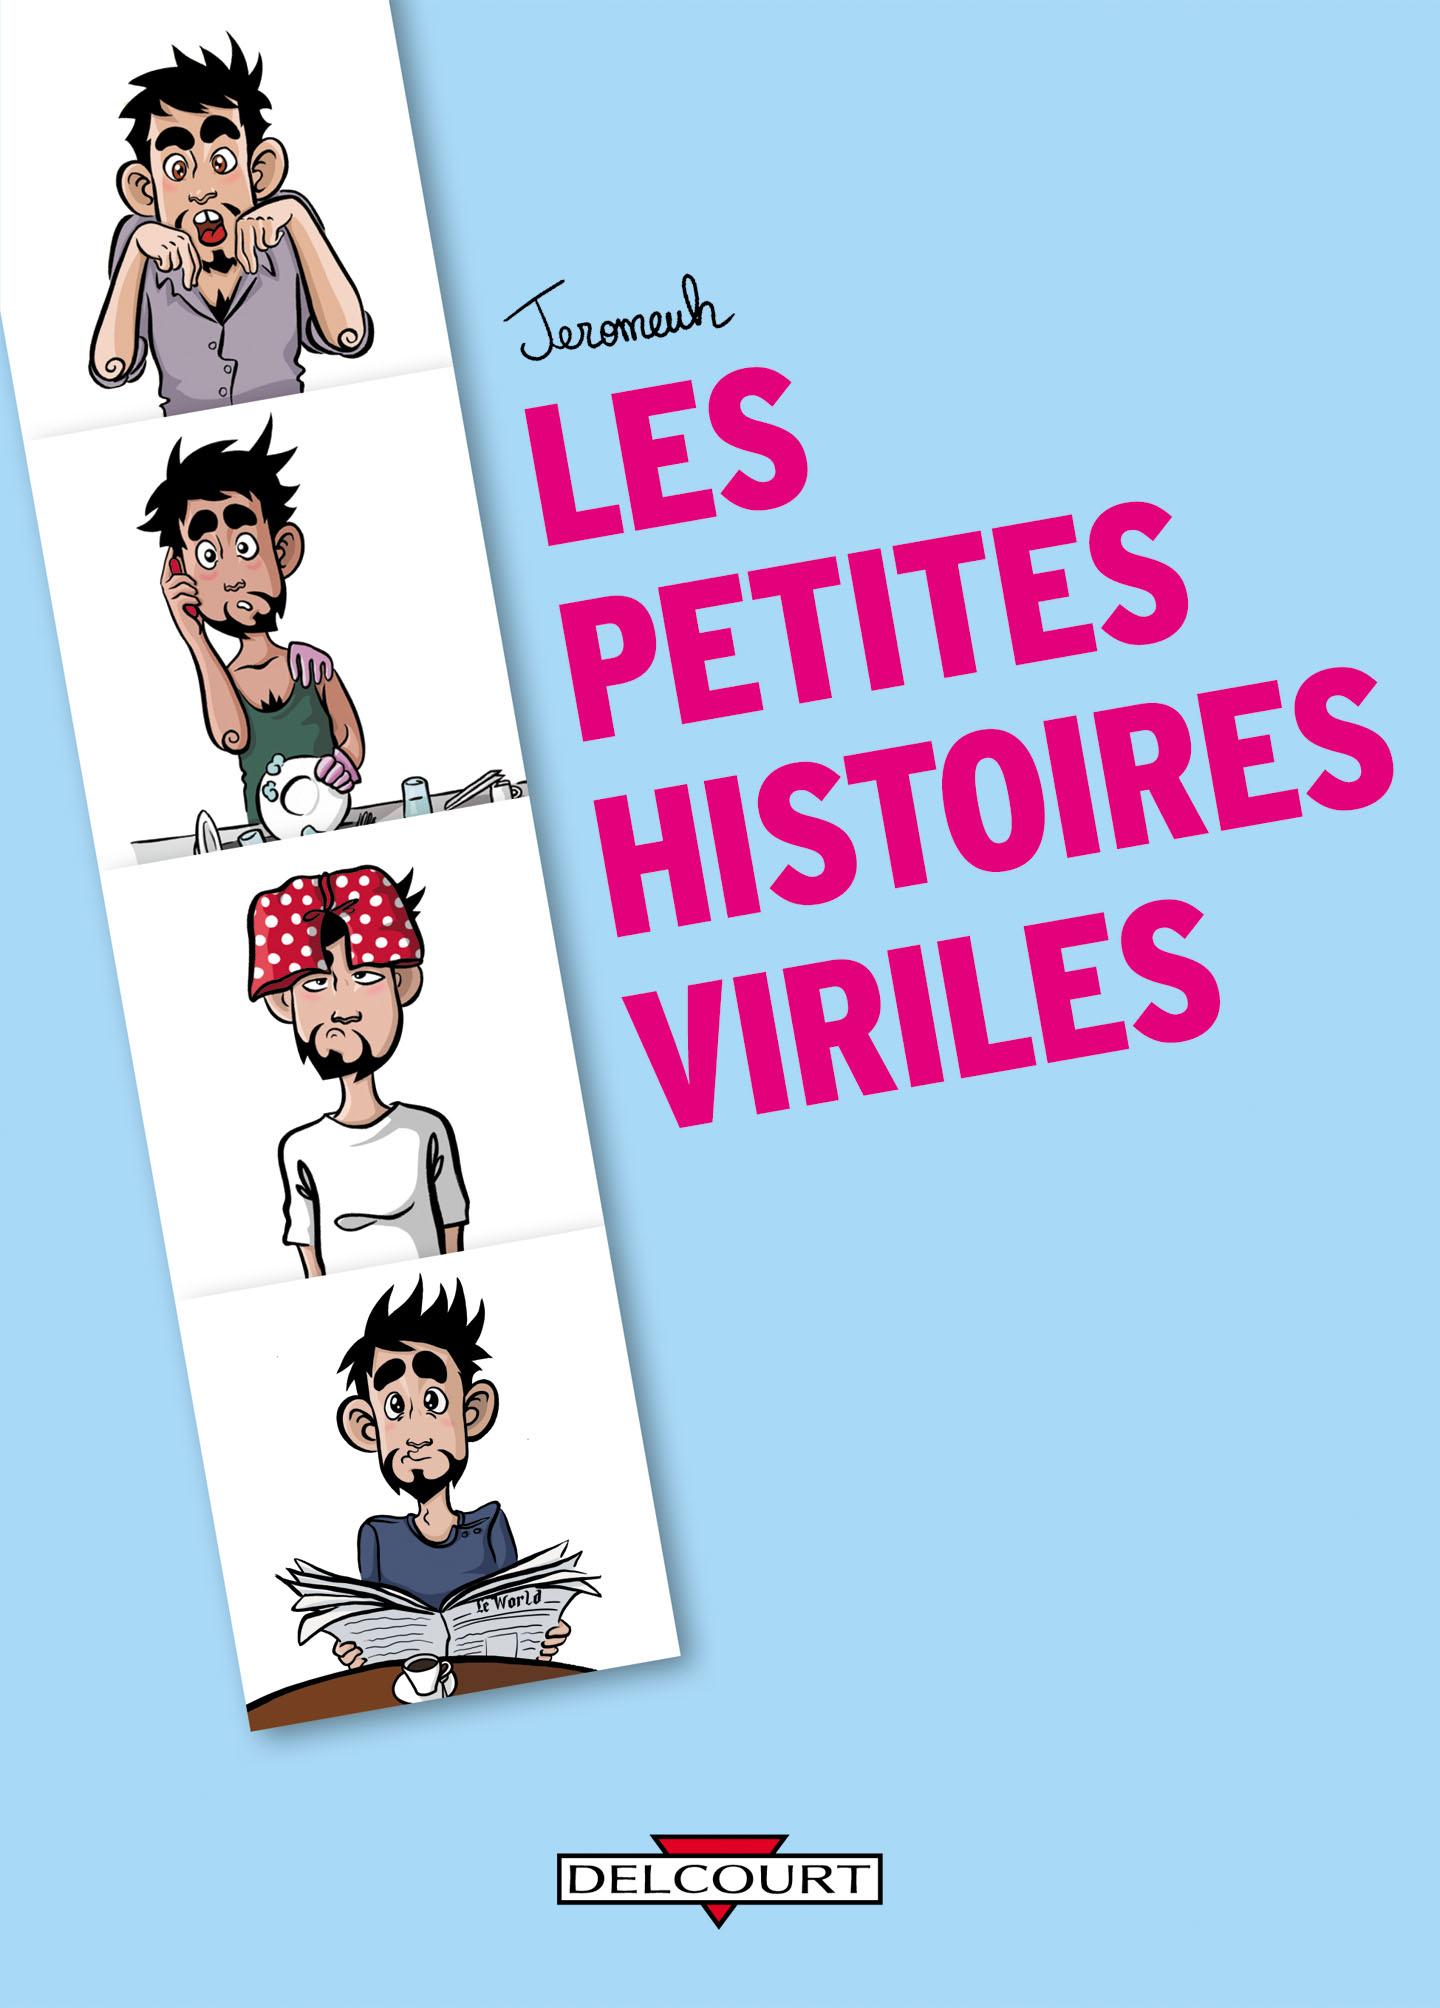 Petites histoires viriles 1 - Petites histoires viriles